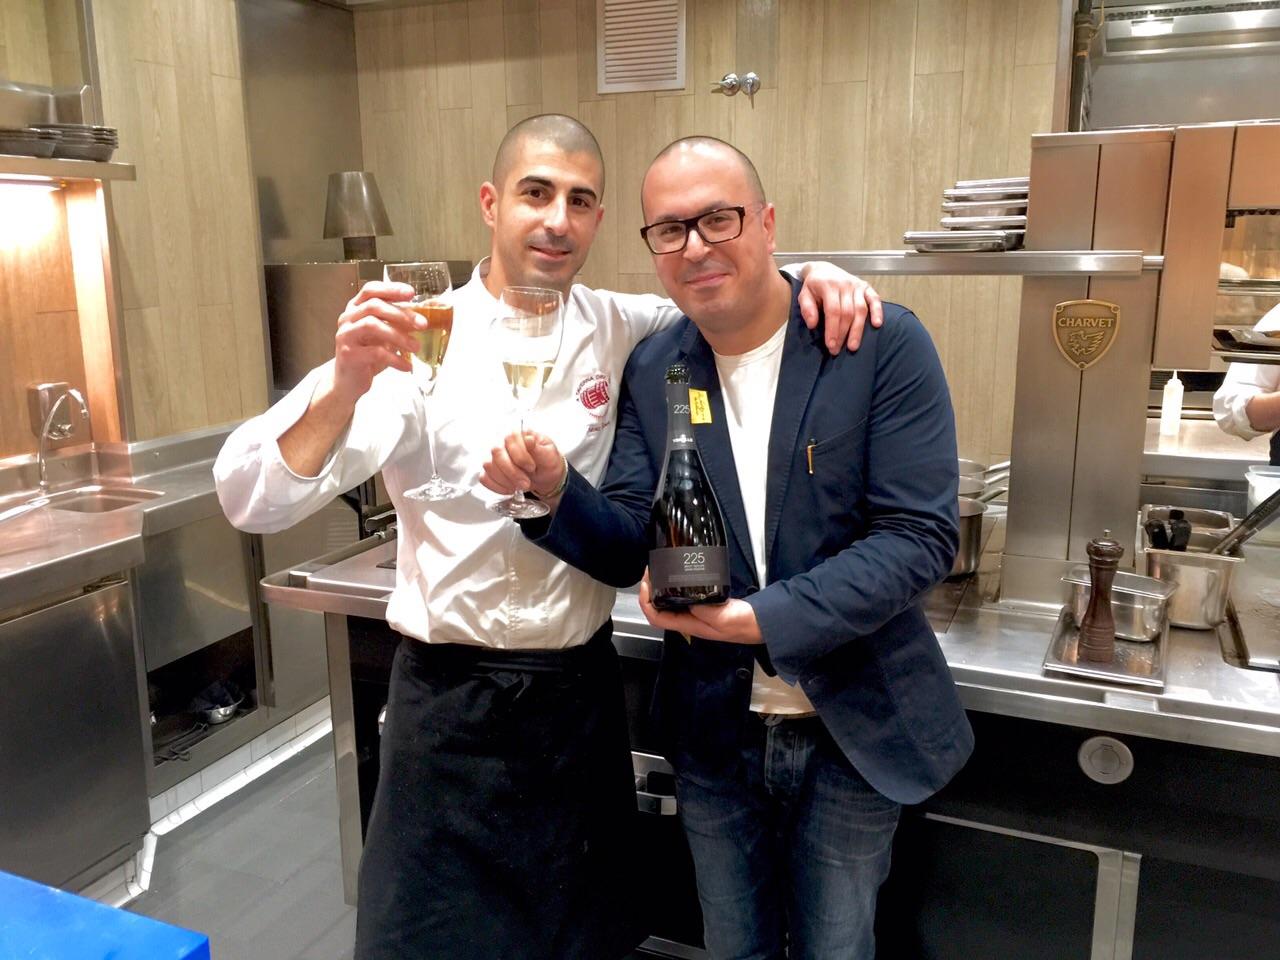 Toni y Manuel Simôes en la cocina de La Taverna del Clinic